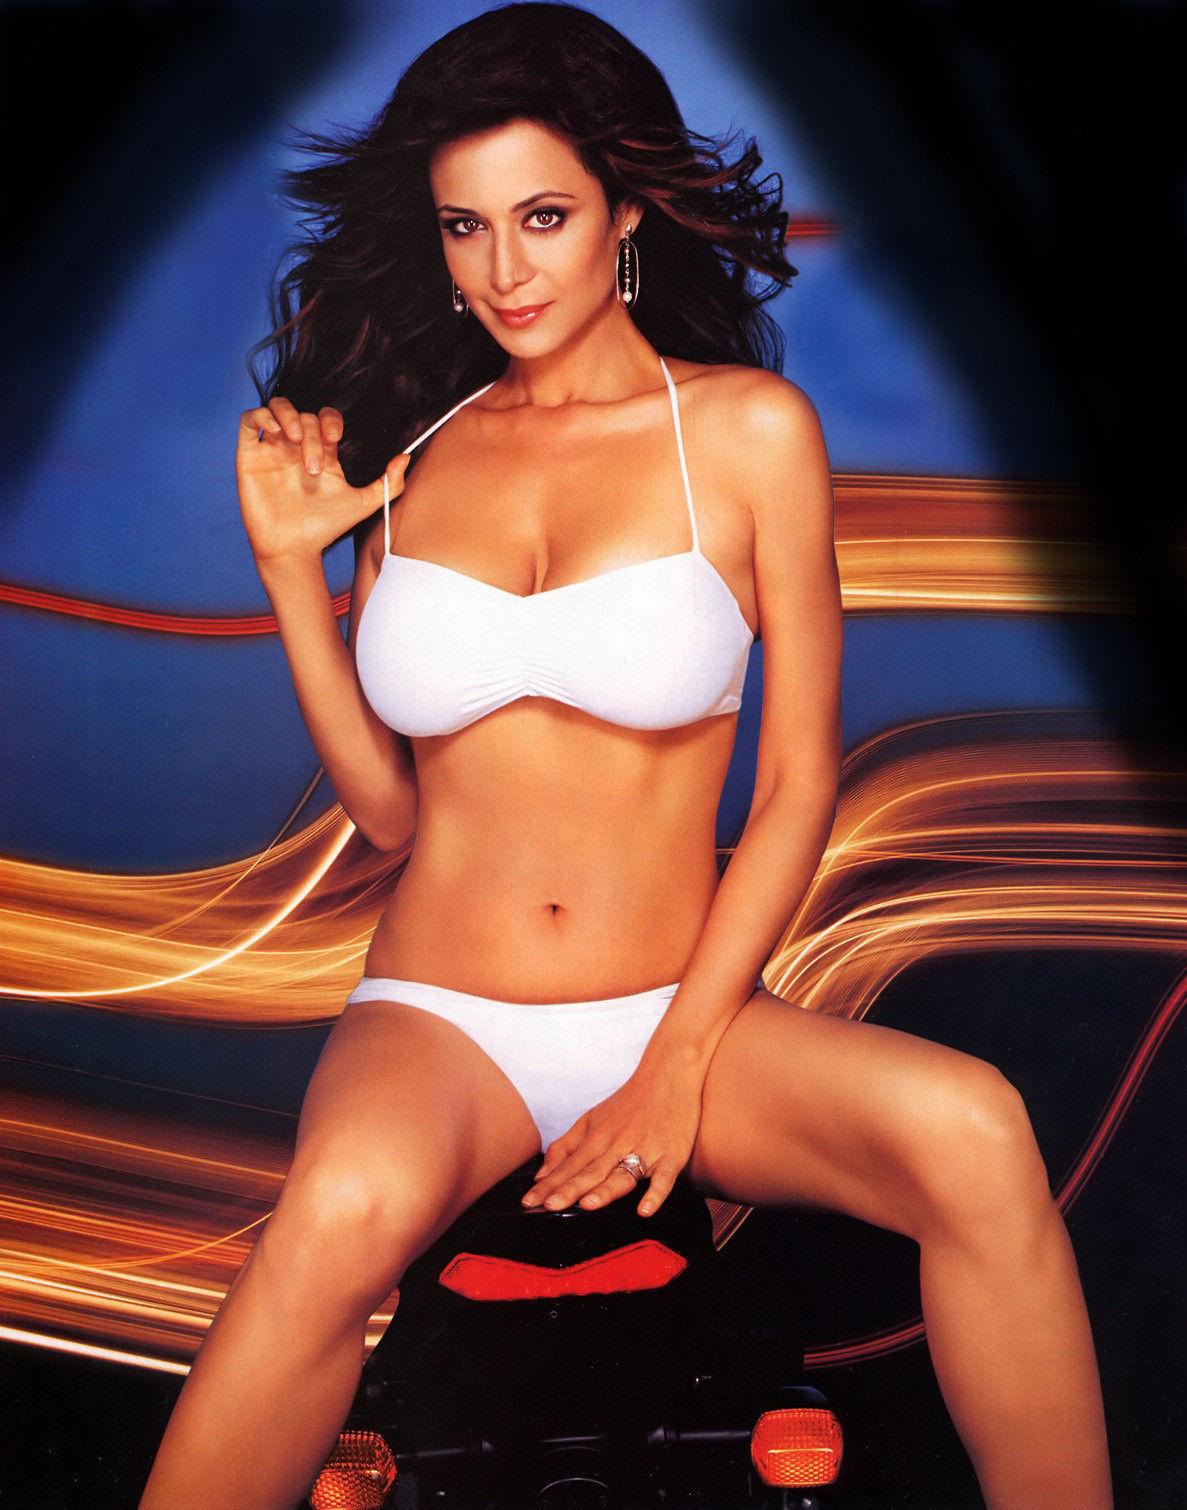 Catherine bell 8x10 celebrity photo picture hot sexy bikini 51